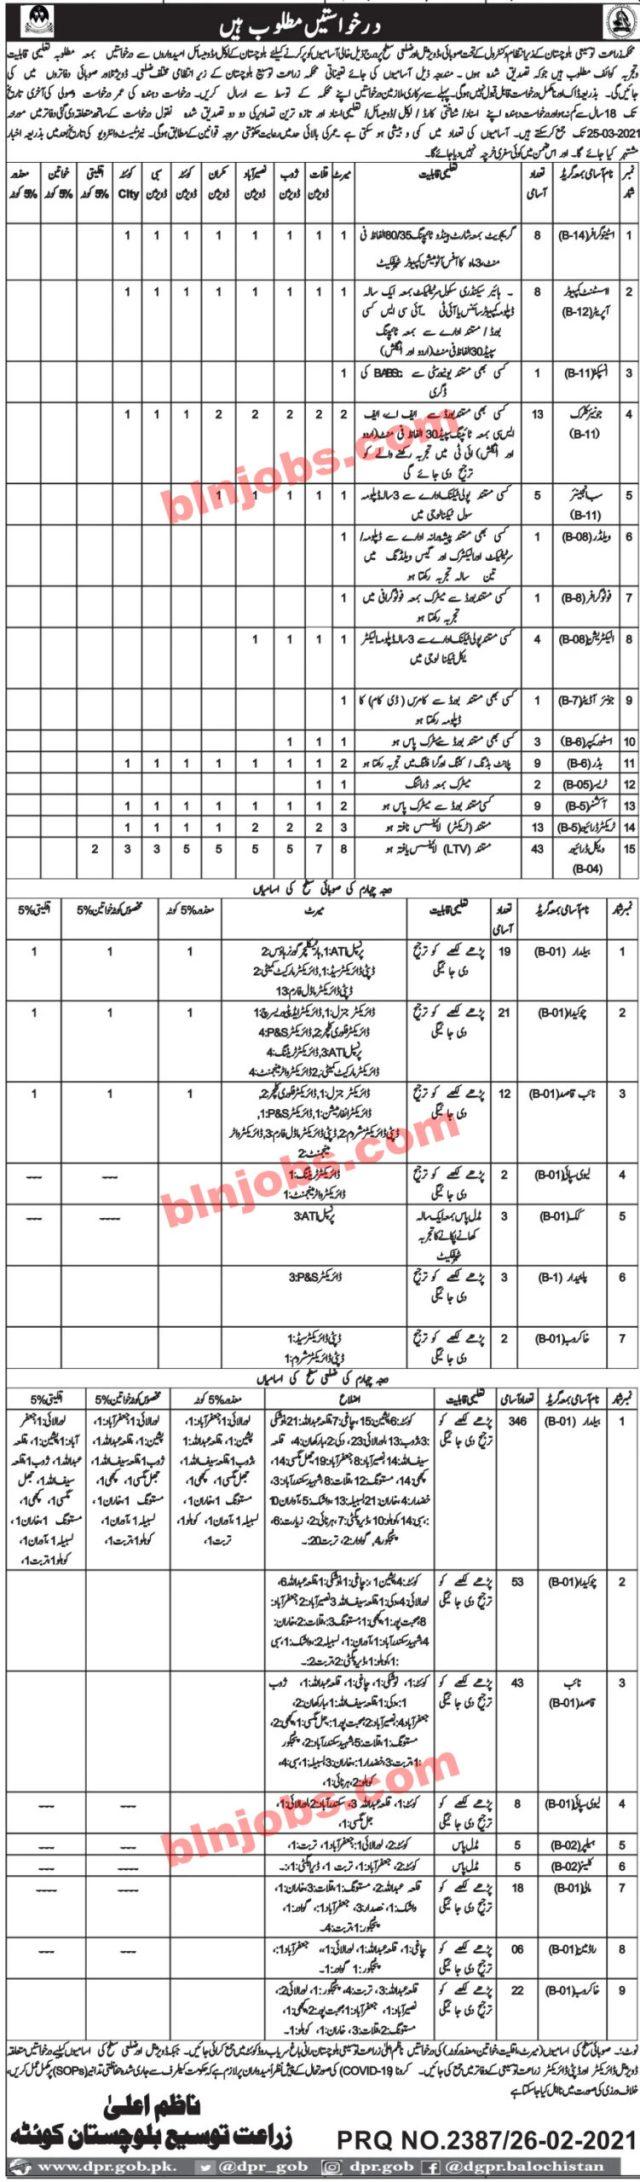 Balochistan Agriculture Extension Department Jobs 2021